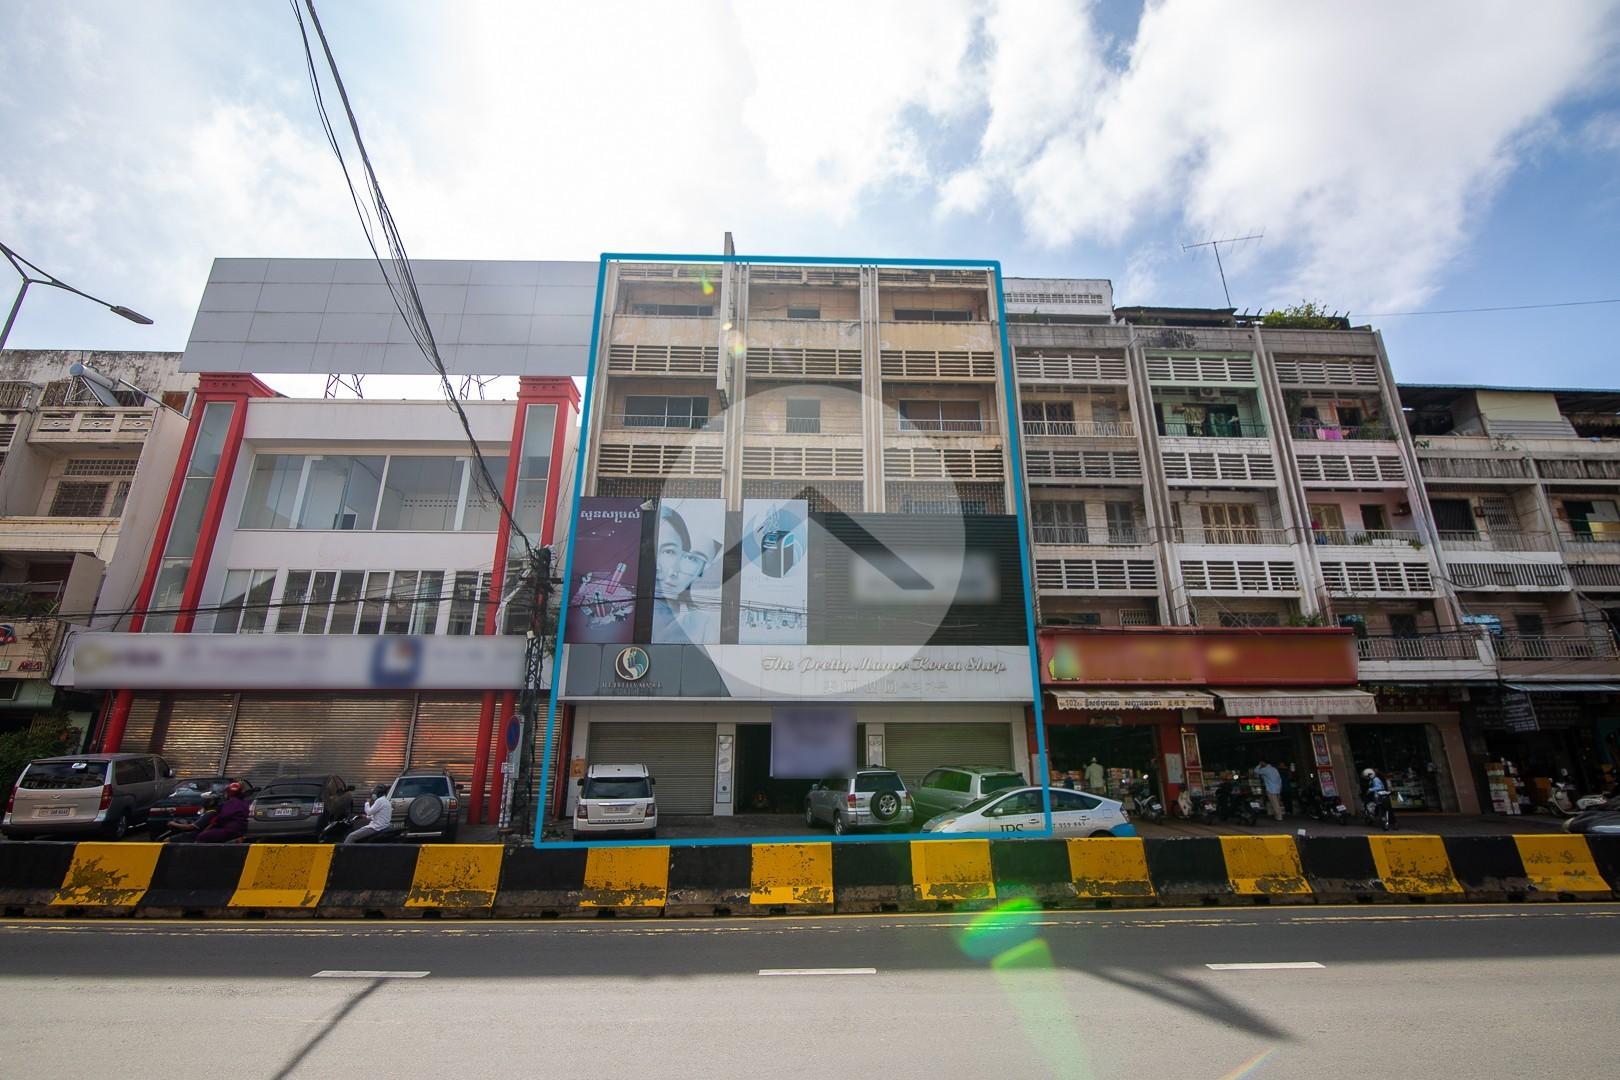 465 Sqm Commercial Building For Rent - Orussey 3, Phnom Penh